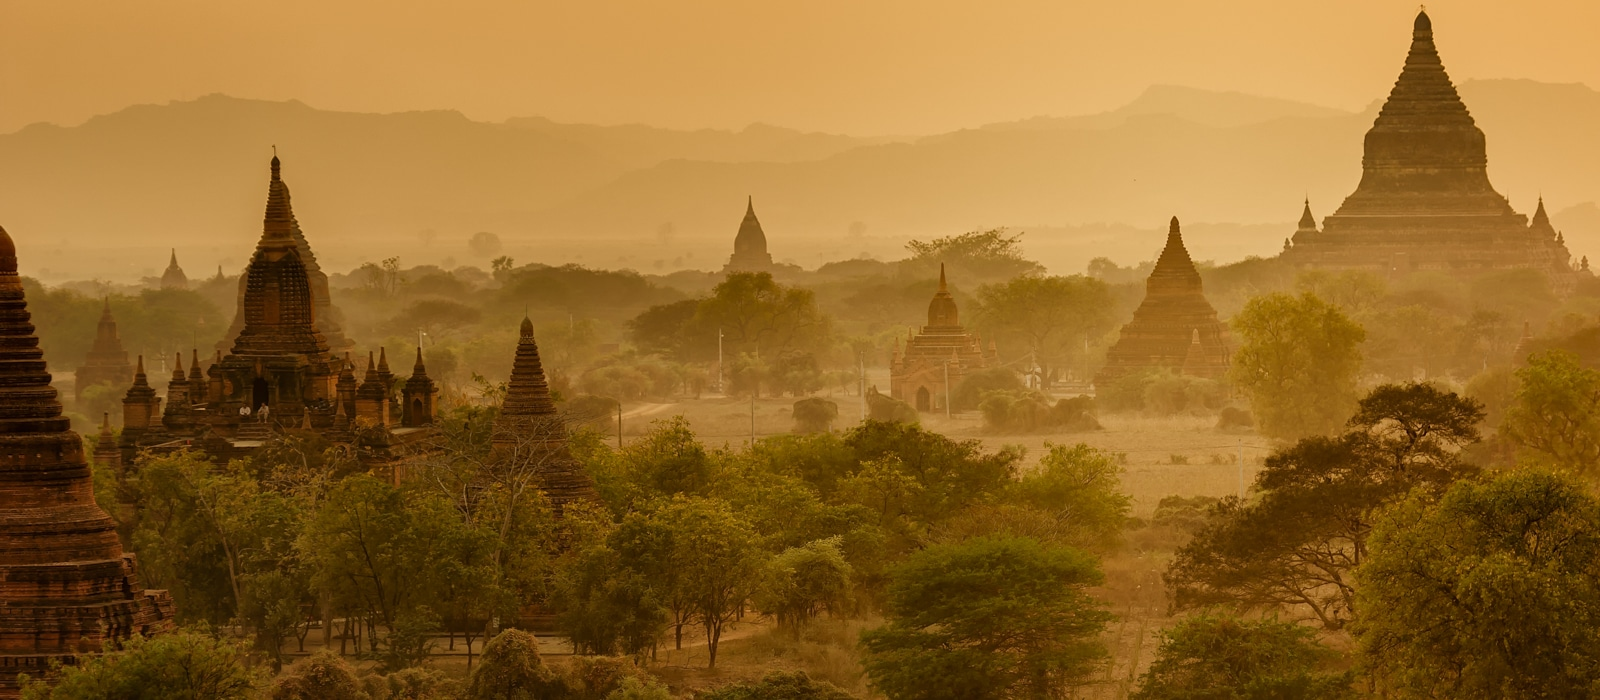 img-diapo-entete - Myanmar-1600x700-9.jpg